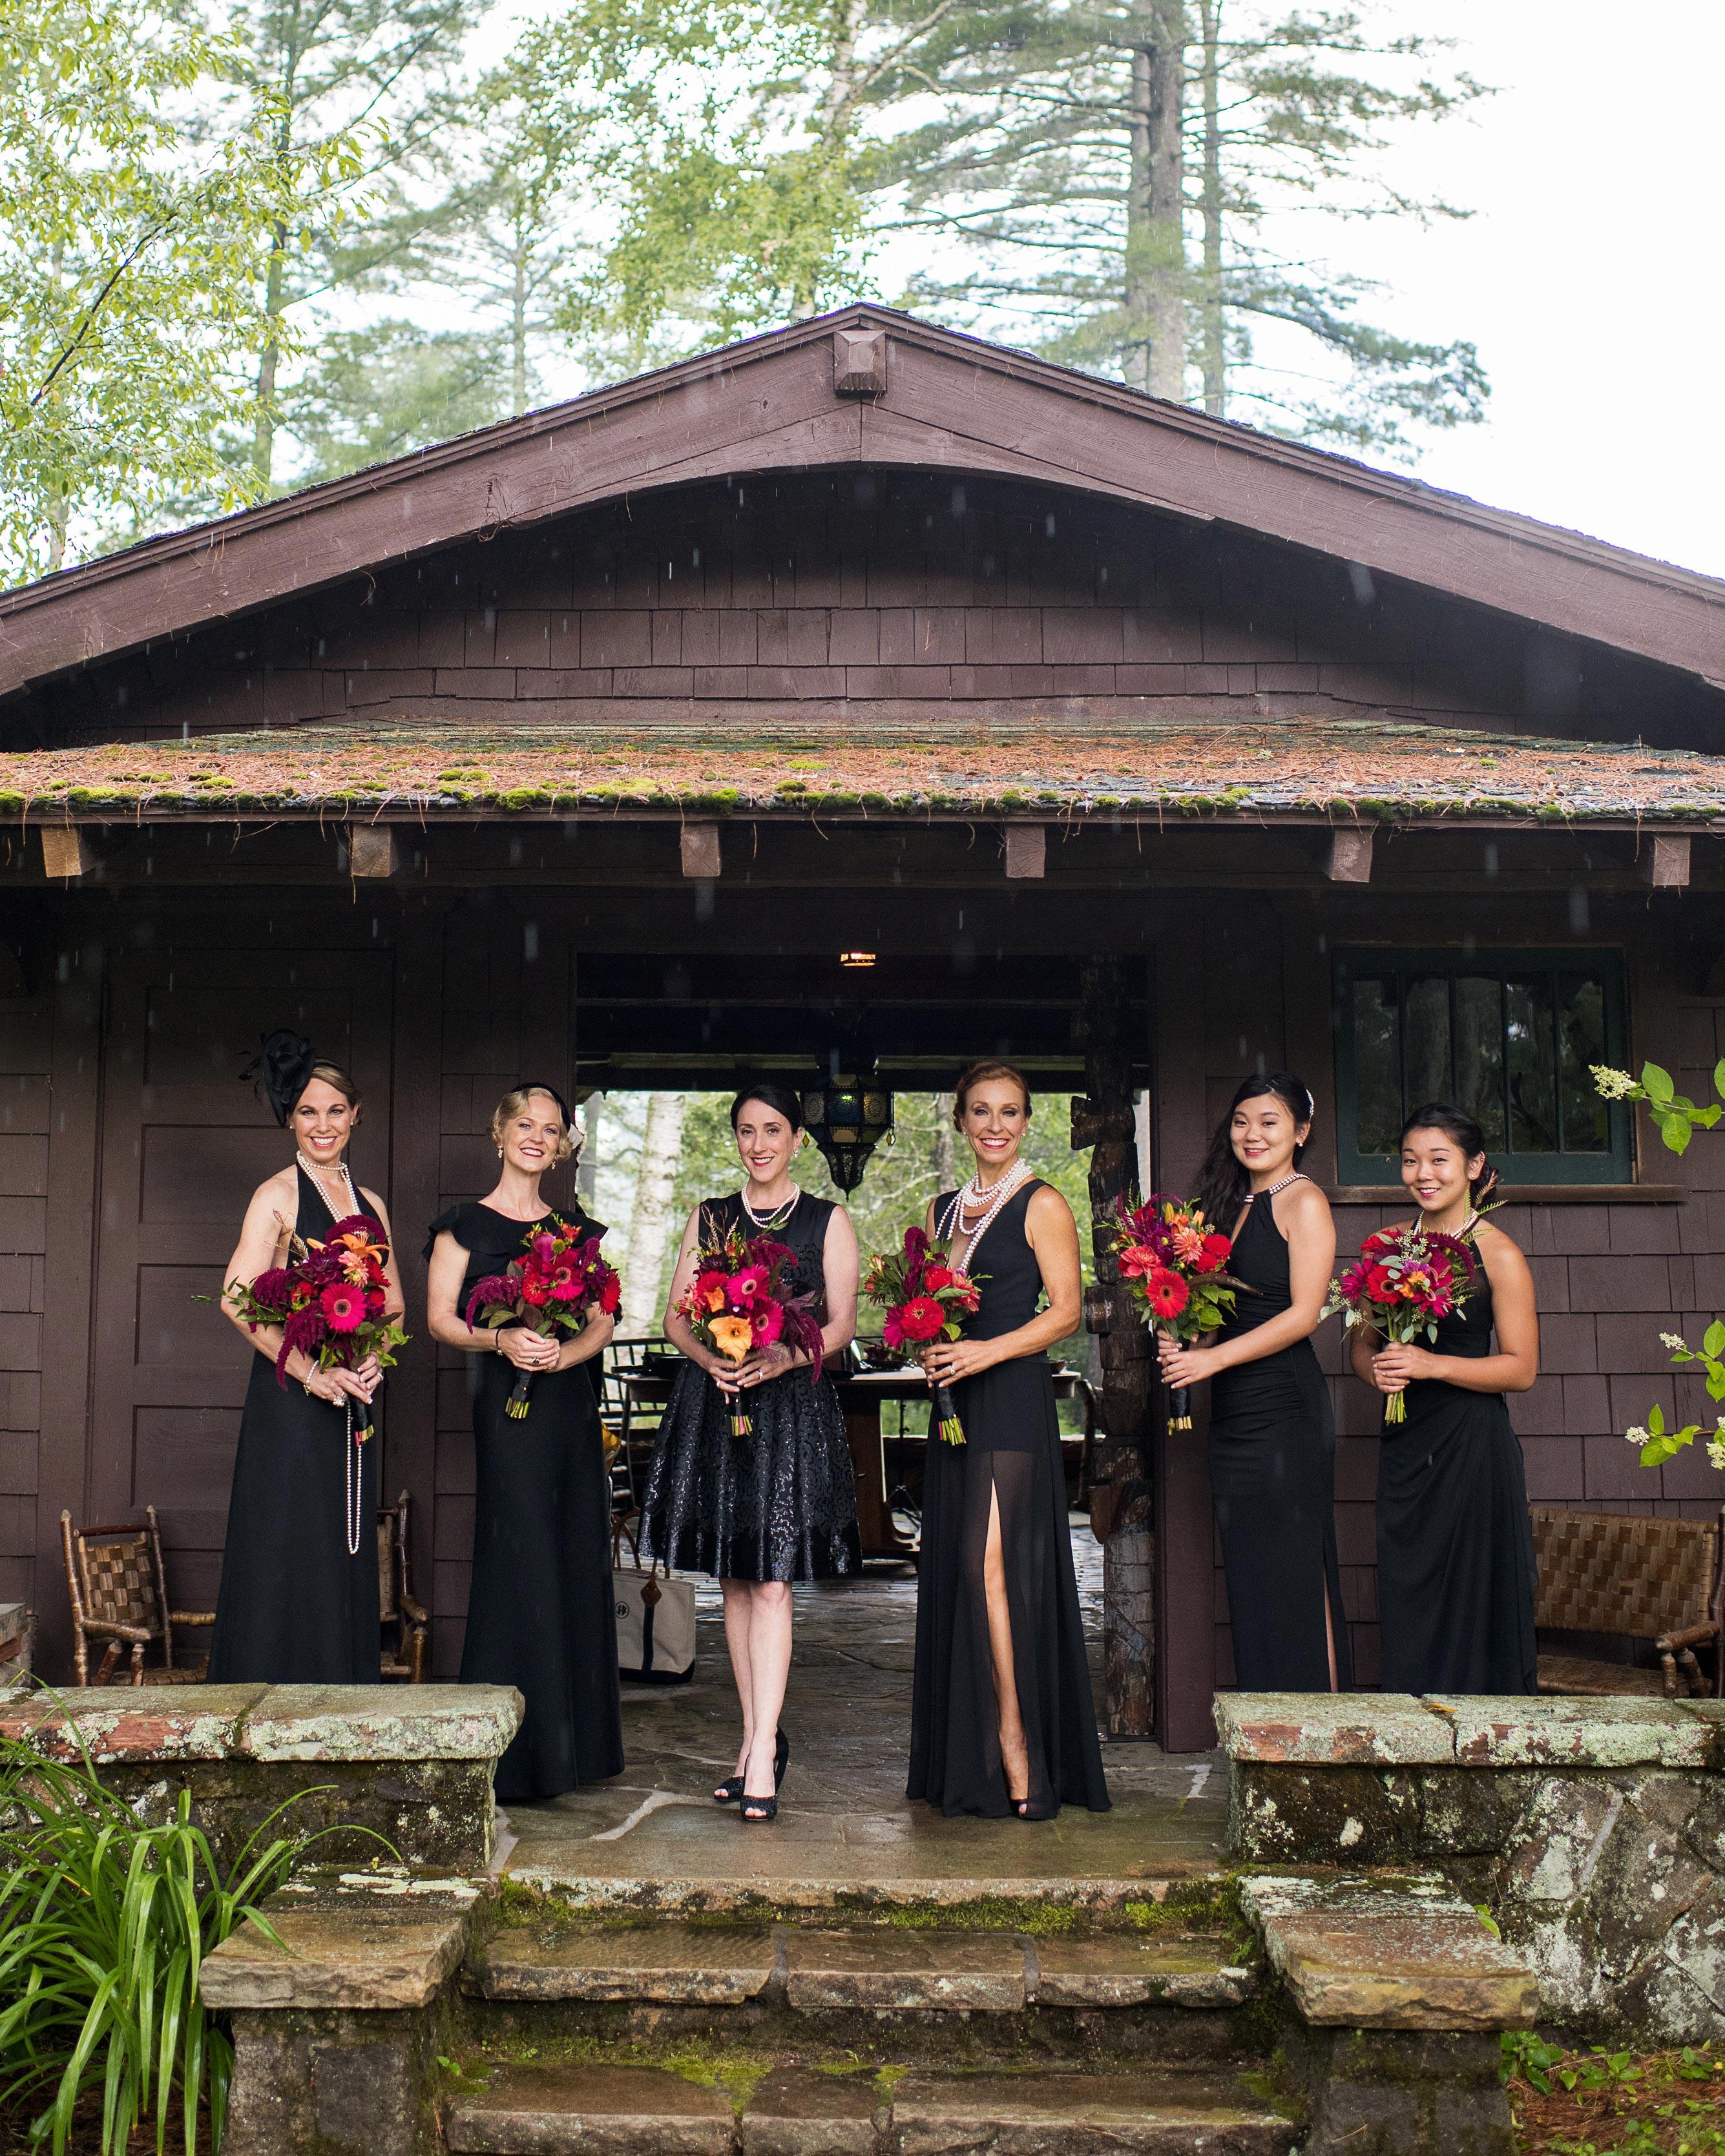 christopher-stephen-wedding-bridesmaids-0179-s112787-0416.jpg